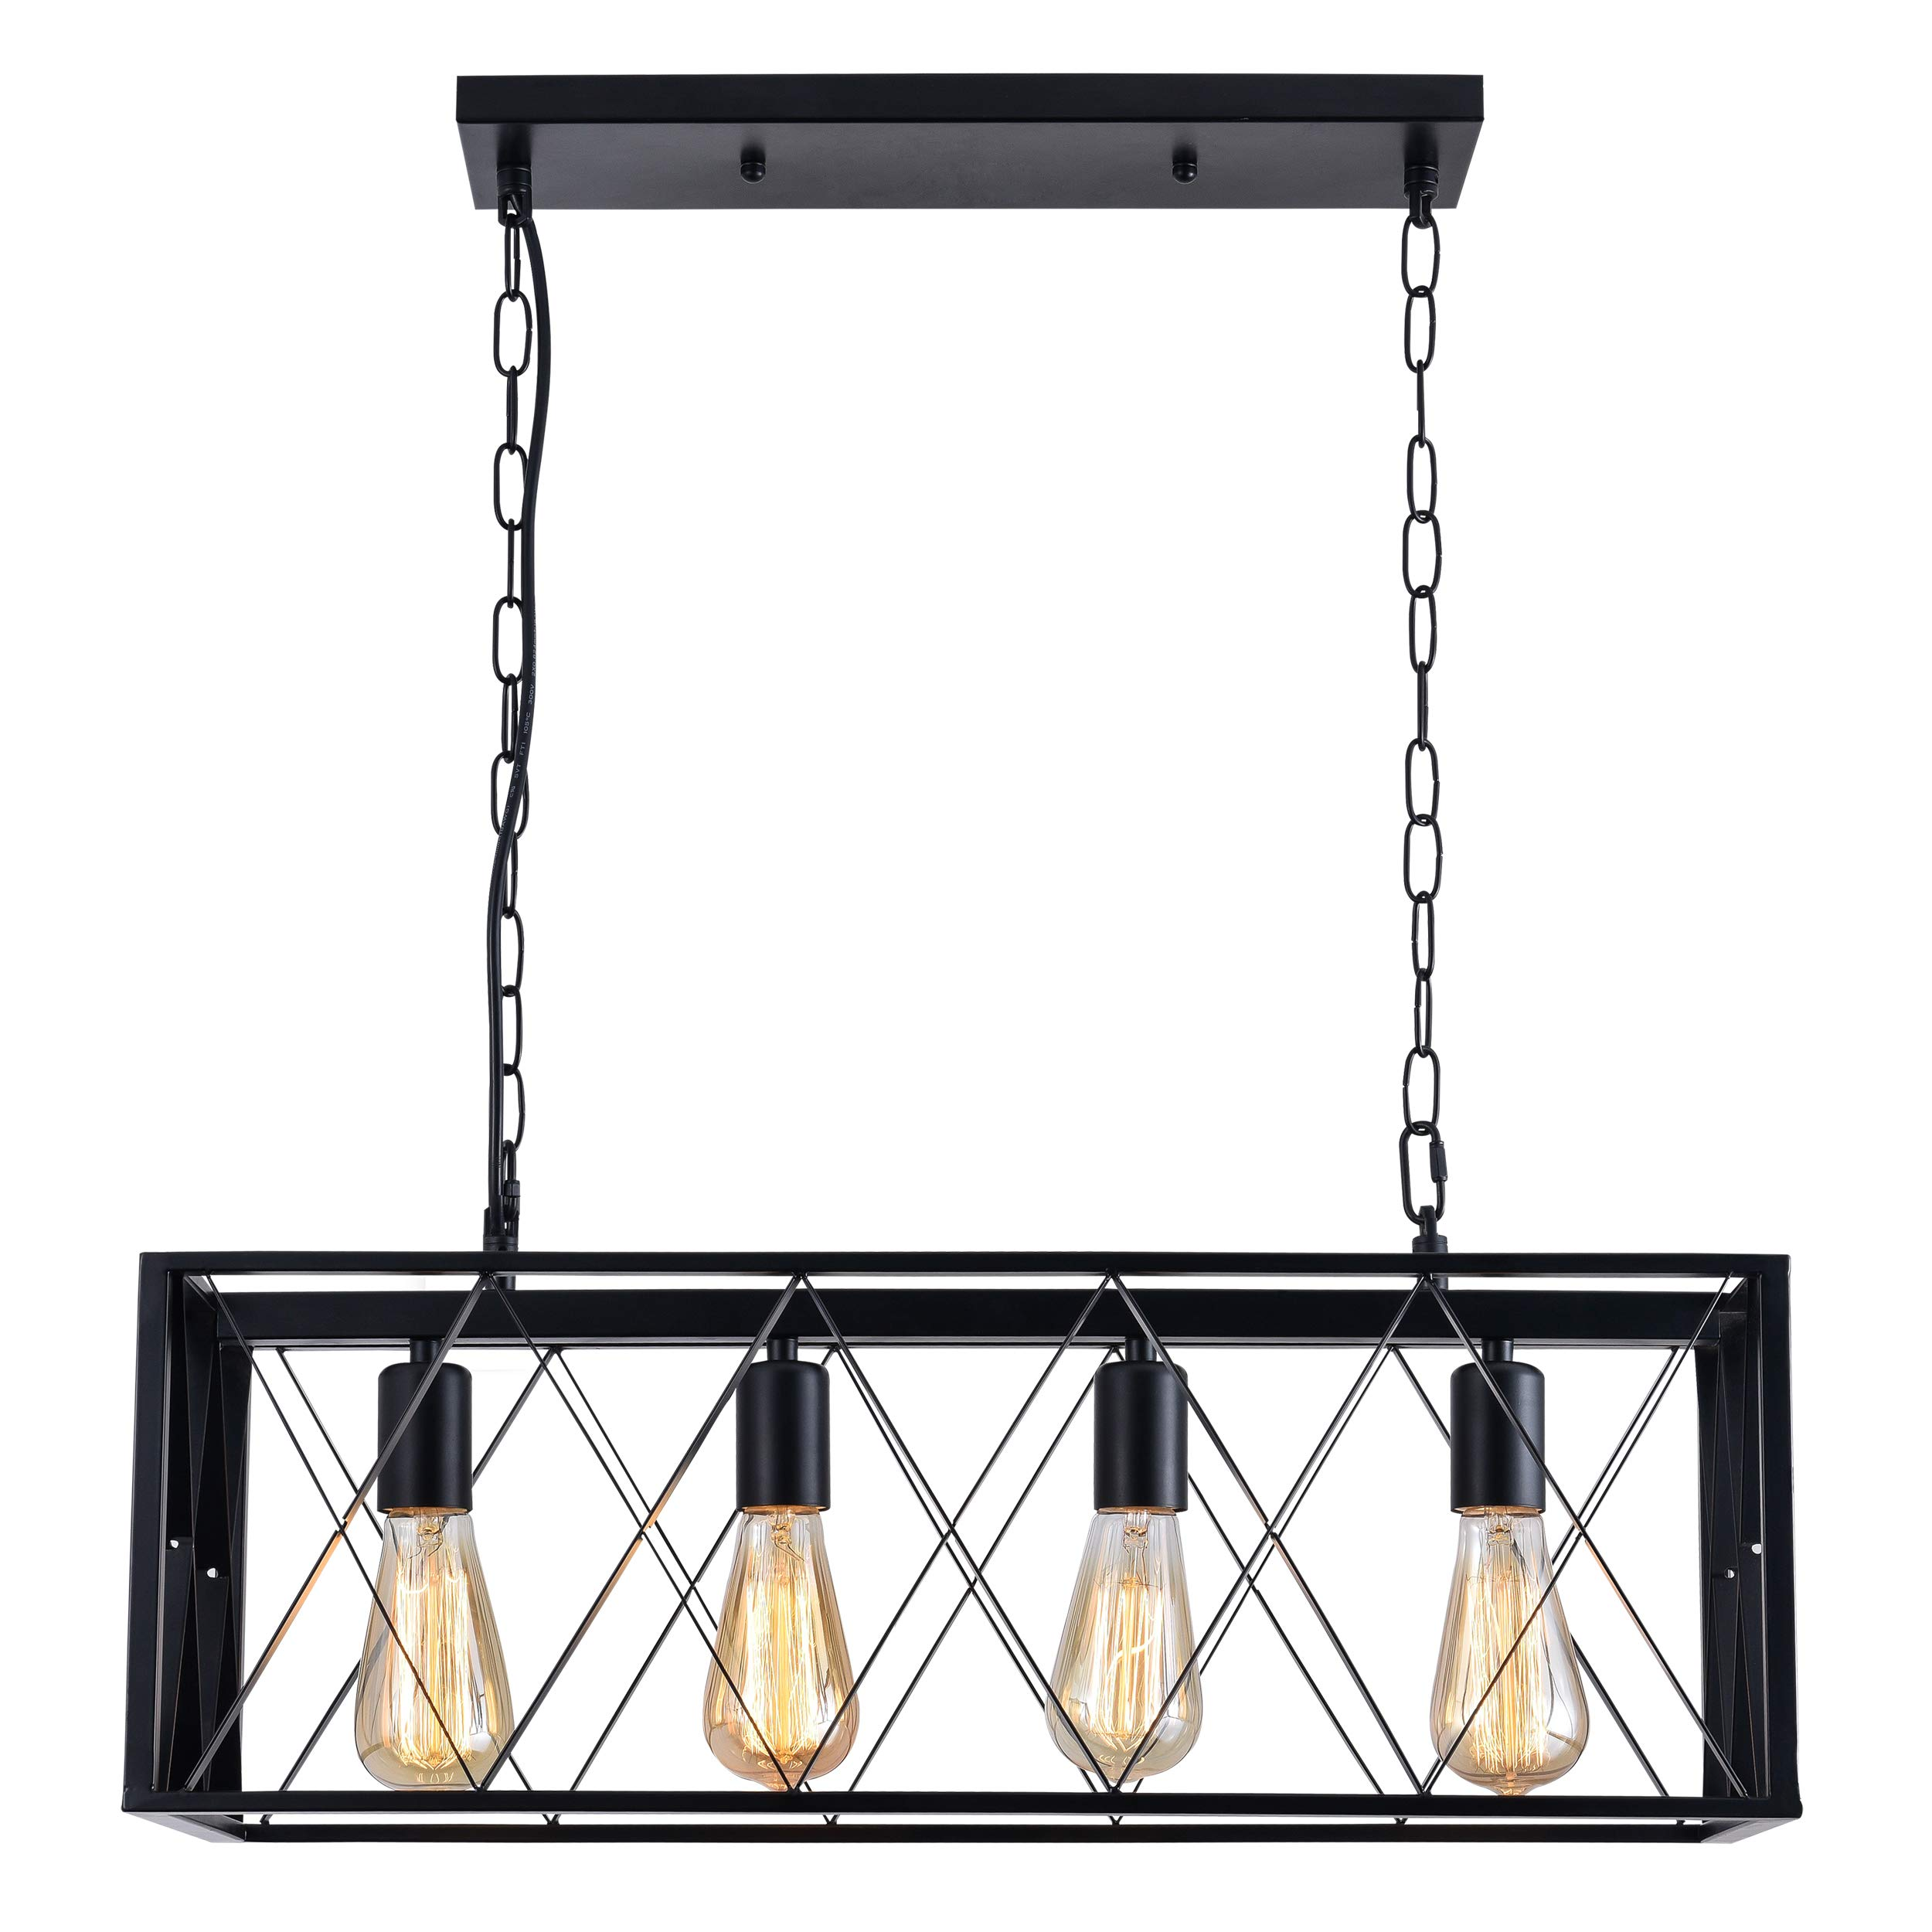 ISRAMP Kitchen Island Lighting Fixtures, 4-Light Rectangle Iron Matte Black Shade Industrial Pendant Light Rustic Farmhouse Chandelier